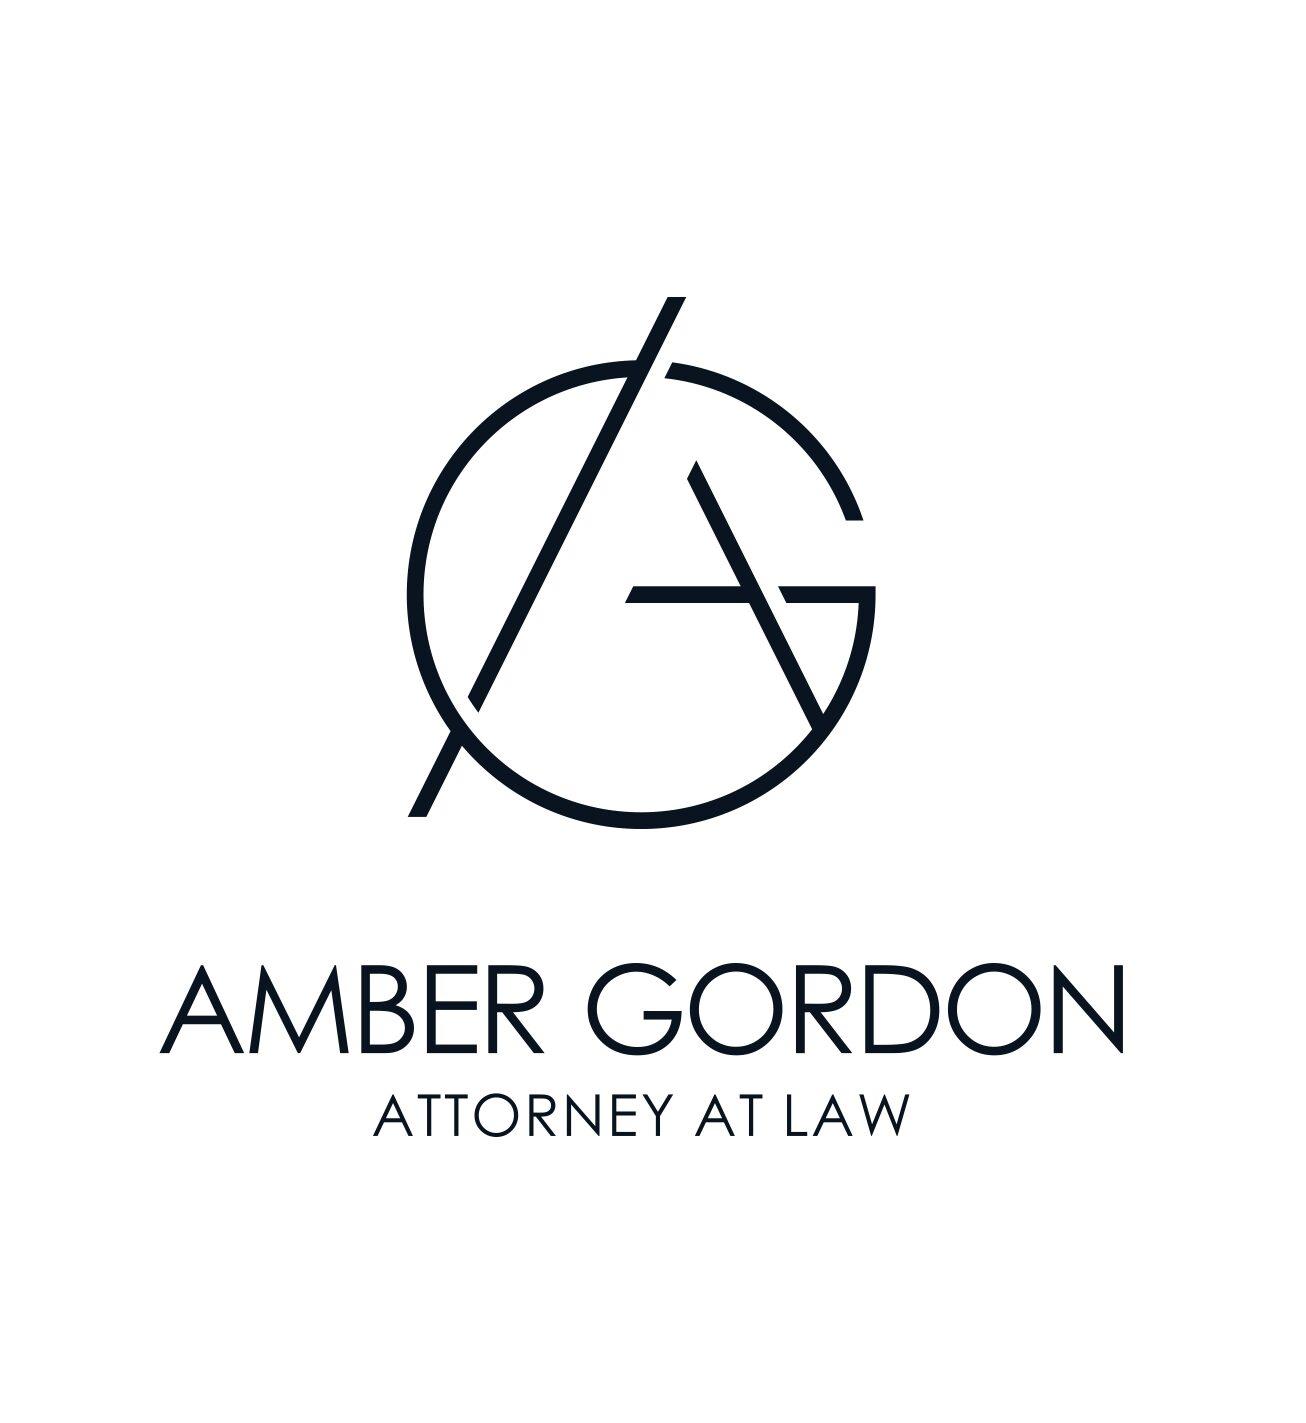 Amber Gordon Attorney at Law